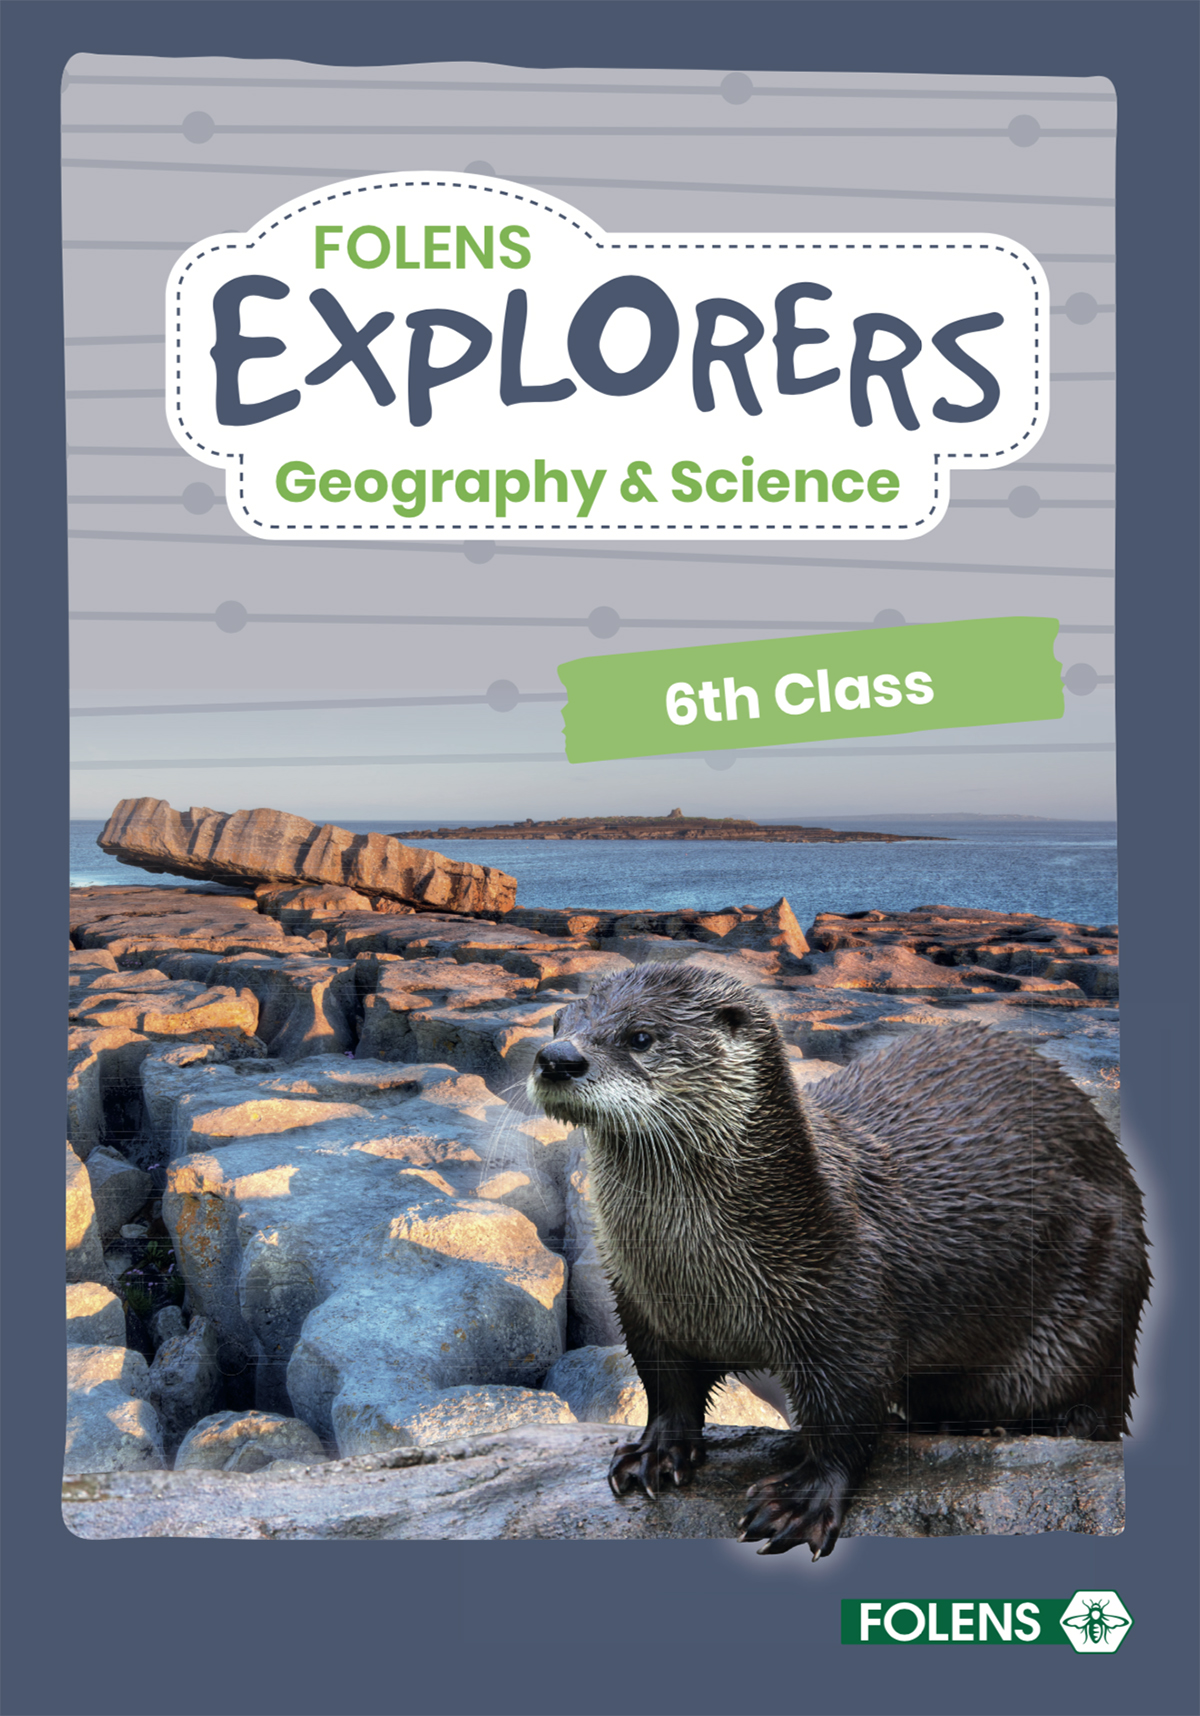 Folens Explorers book